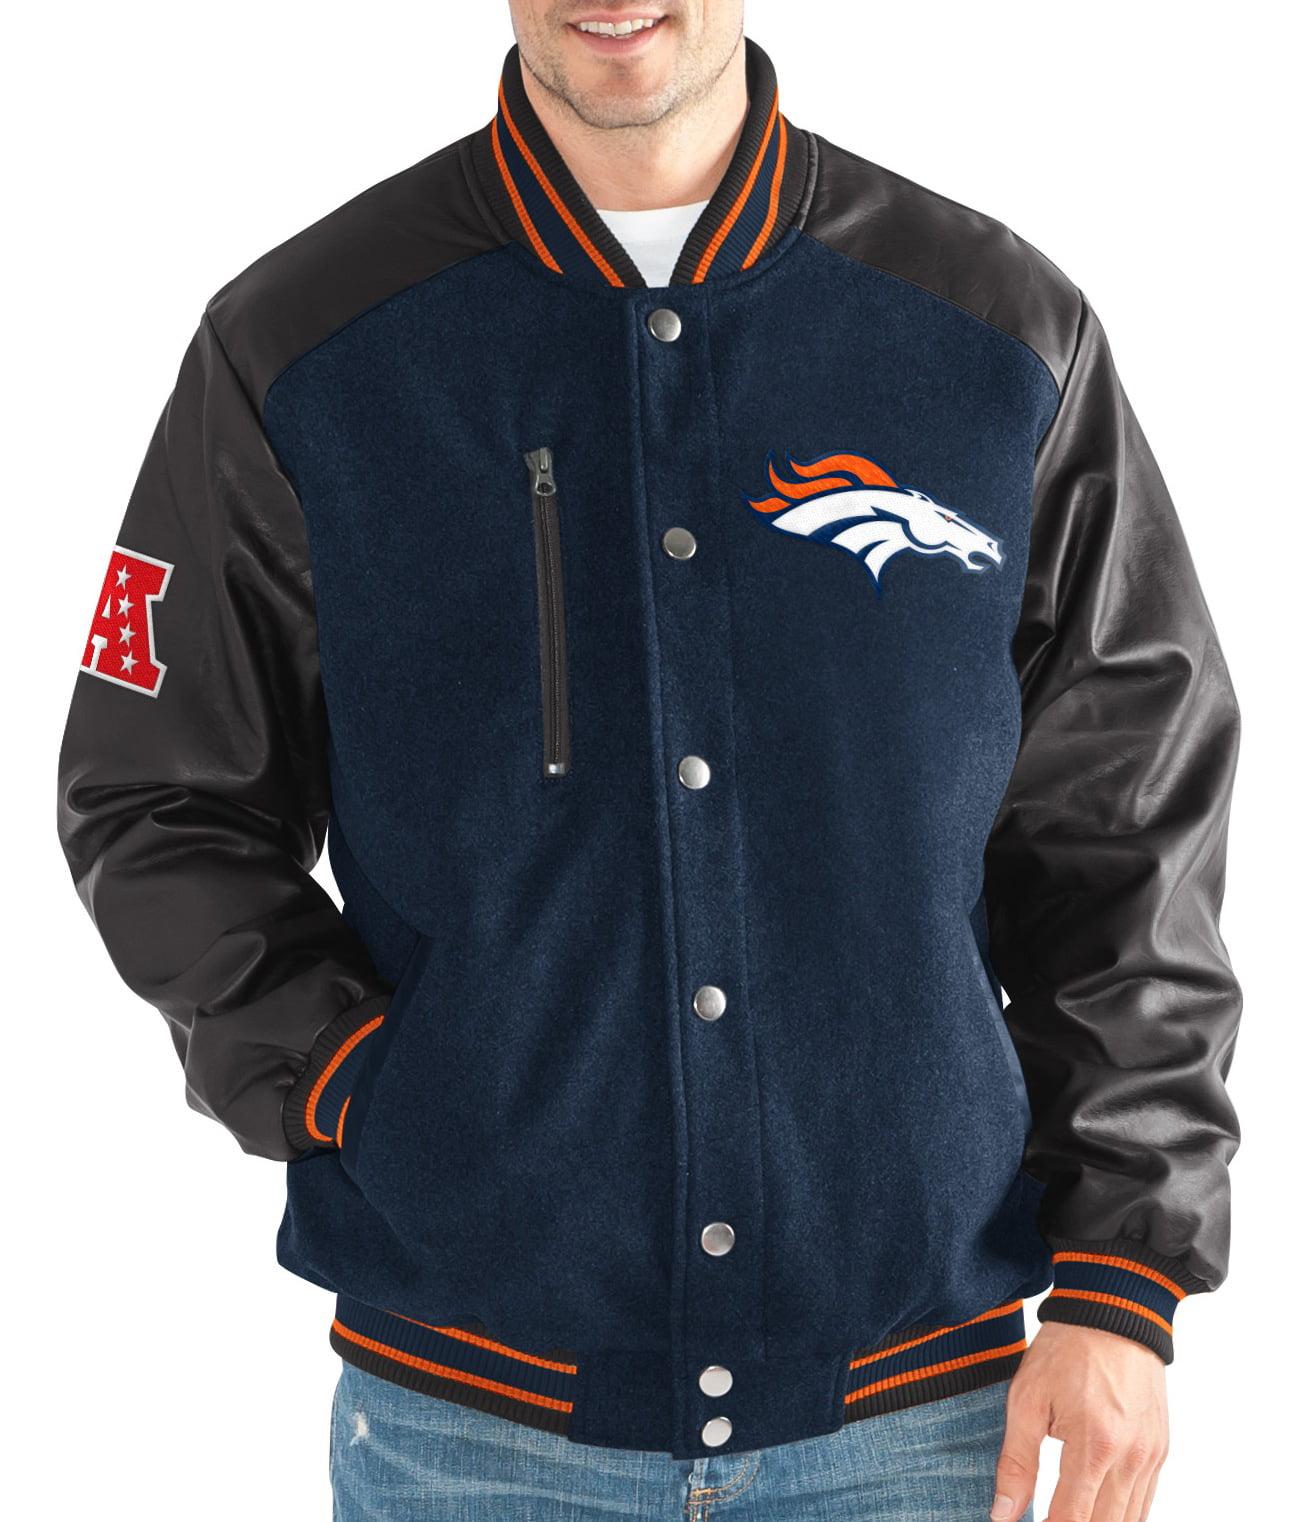 "Denver Broncos G-III NFL ""Heavy Hitter"" Men's Premium Varsity Jacket by G-III Sports"